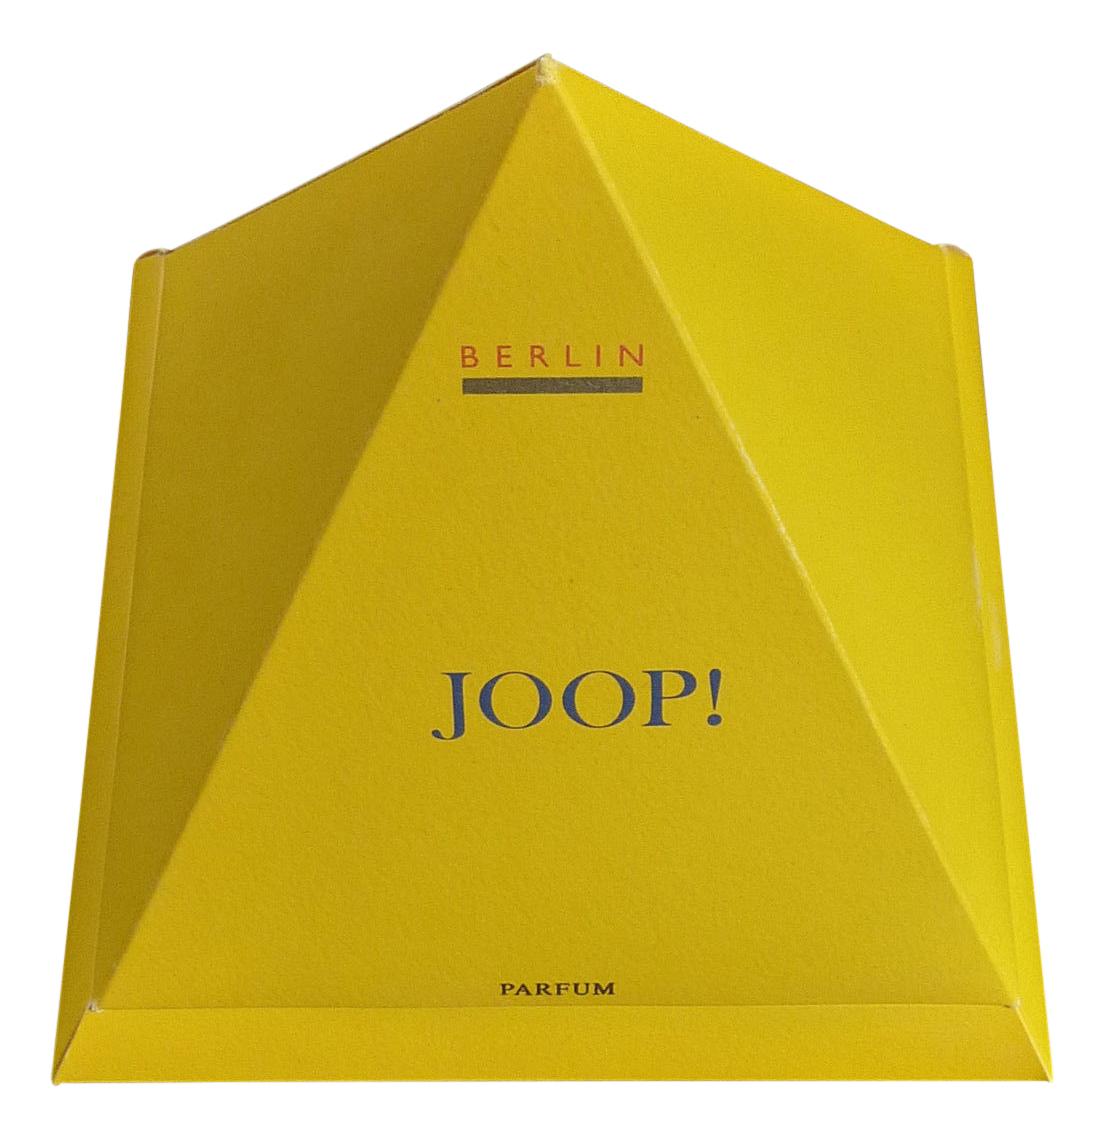 billig für Rabatt verschiedenes Design Qualitätsprodukte Joop! - Berlin Parfum   Reviews and Rating